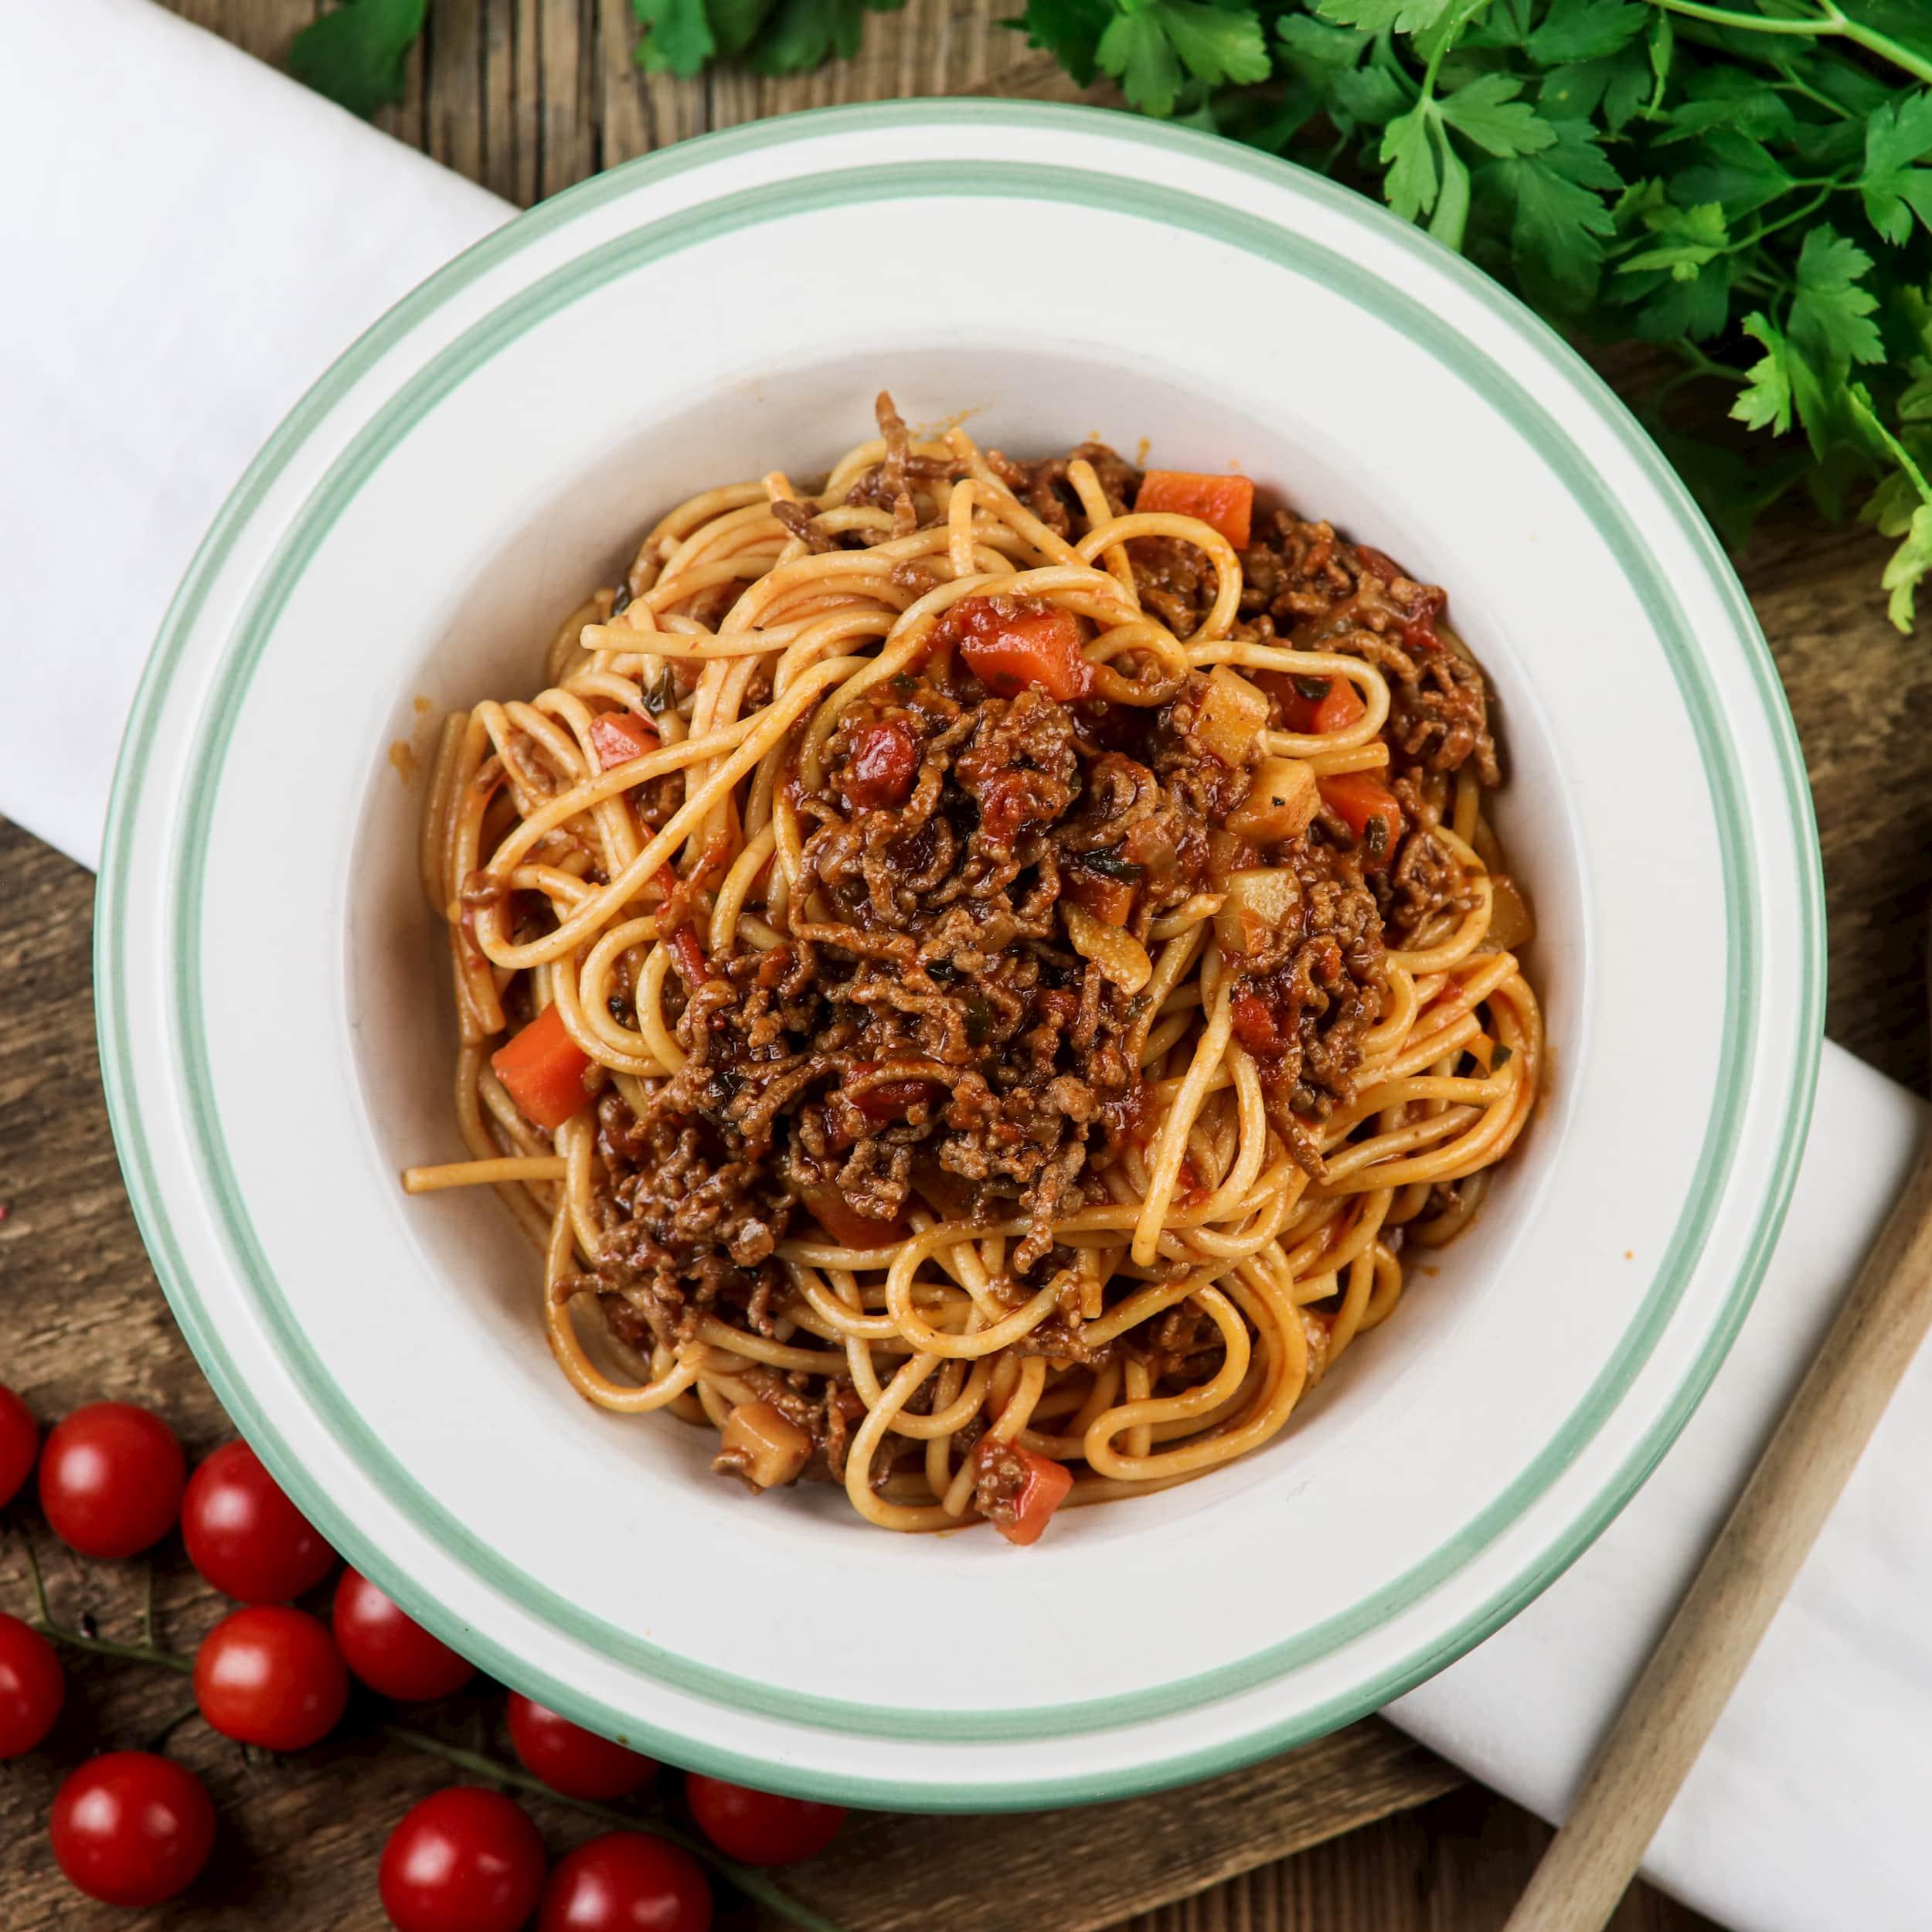 Himmlische Spaghetti Bolognese